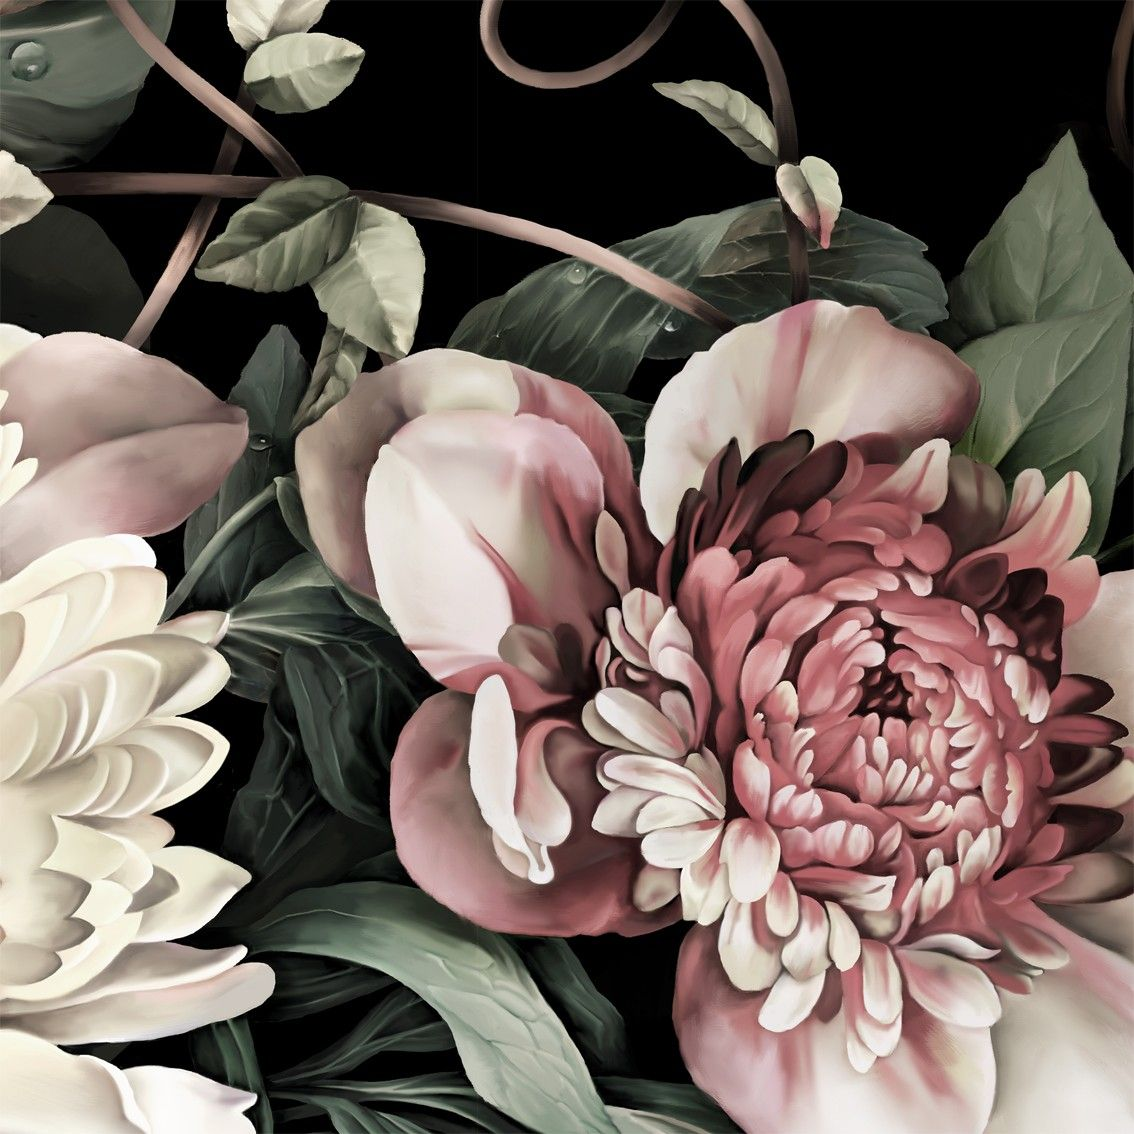 Black floral print wallpaper dark floral wallpaper by ellie cashman - Dark Floral Ii Black Saturated Floral Wallpaper By Ellie Cashman Design